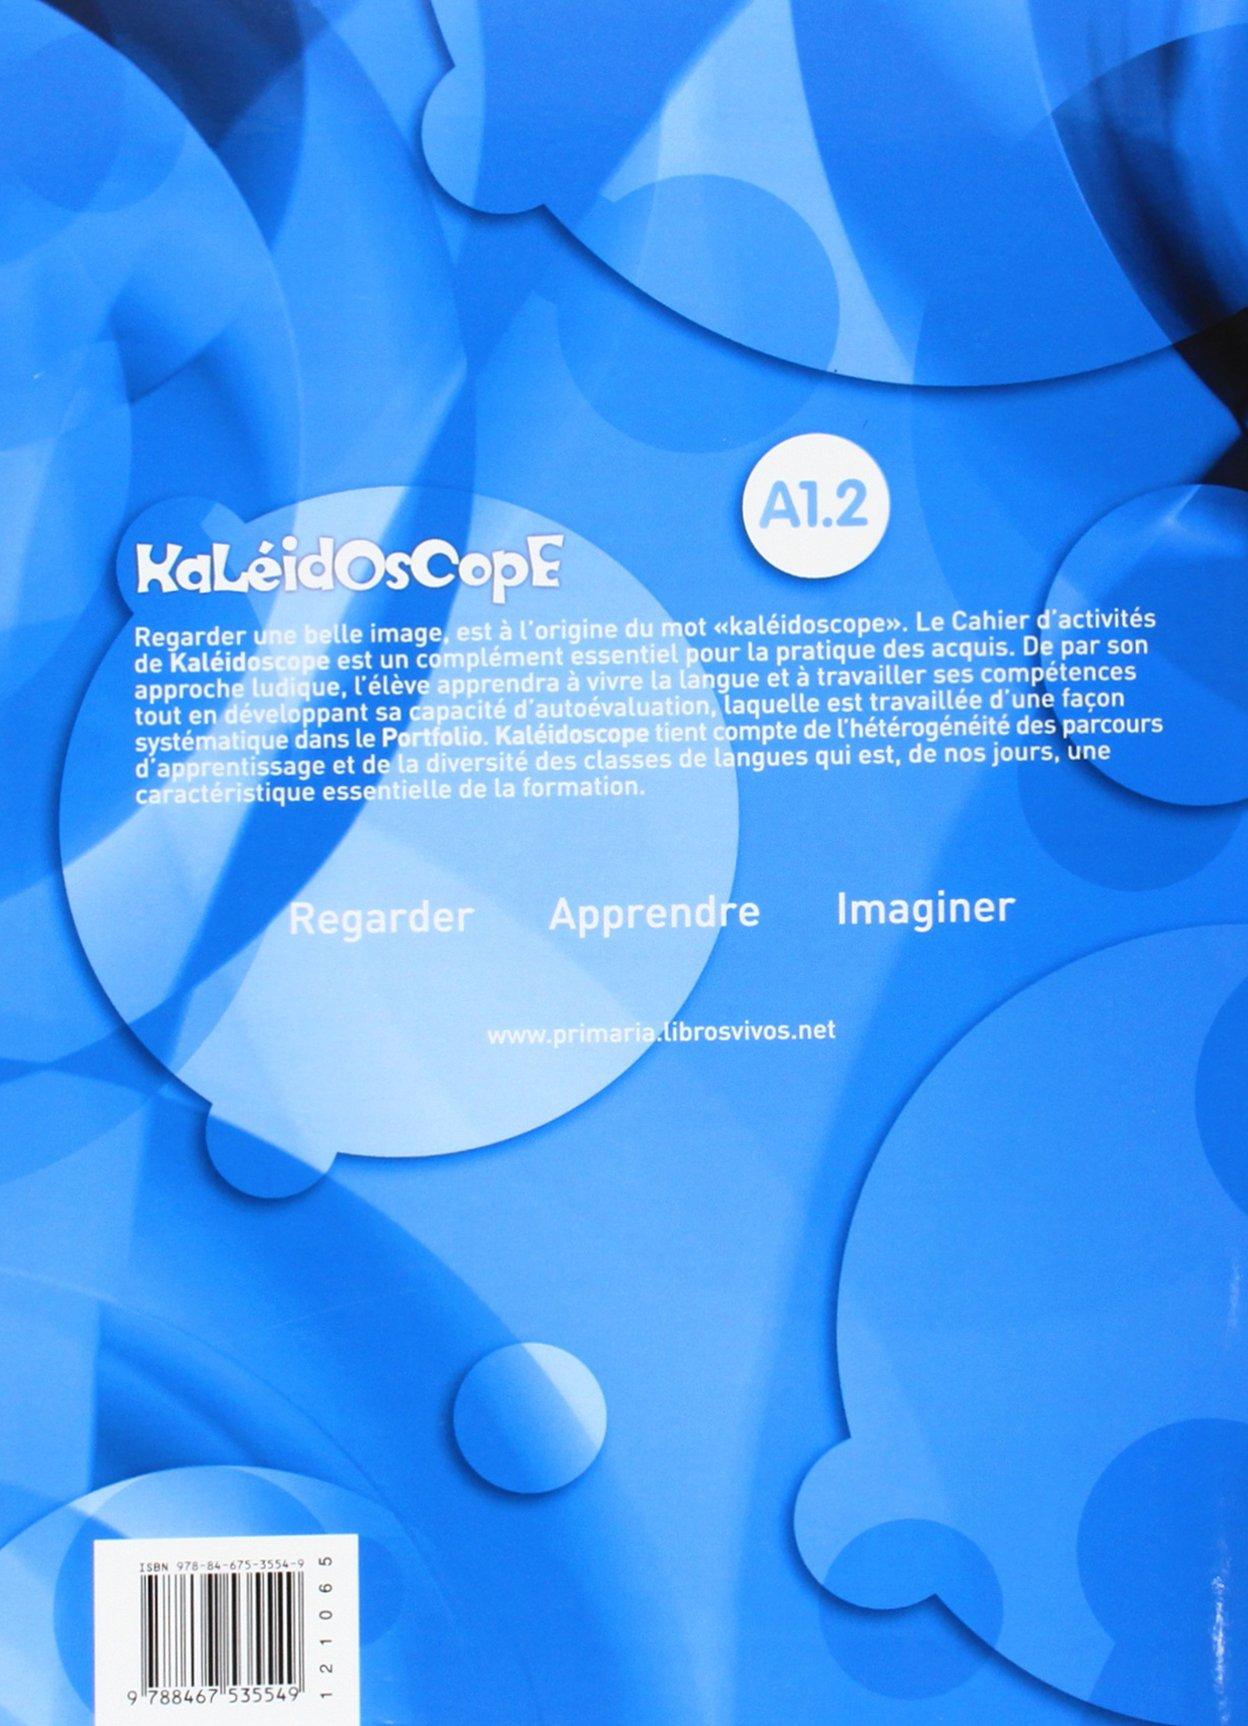 Kaleidoscope 2: Cahier d activités. Portfolio. 6 Primaria: Equipo de  Idiomas de Ediciones SM: 9788467535549: Amazon.com: Books